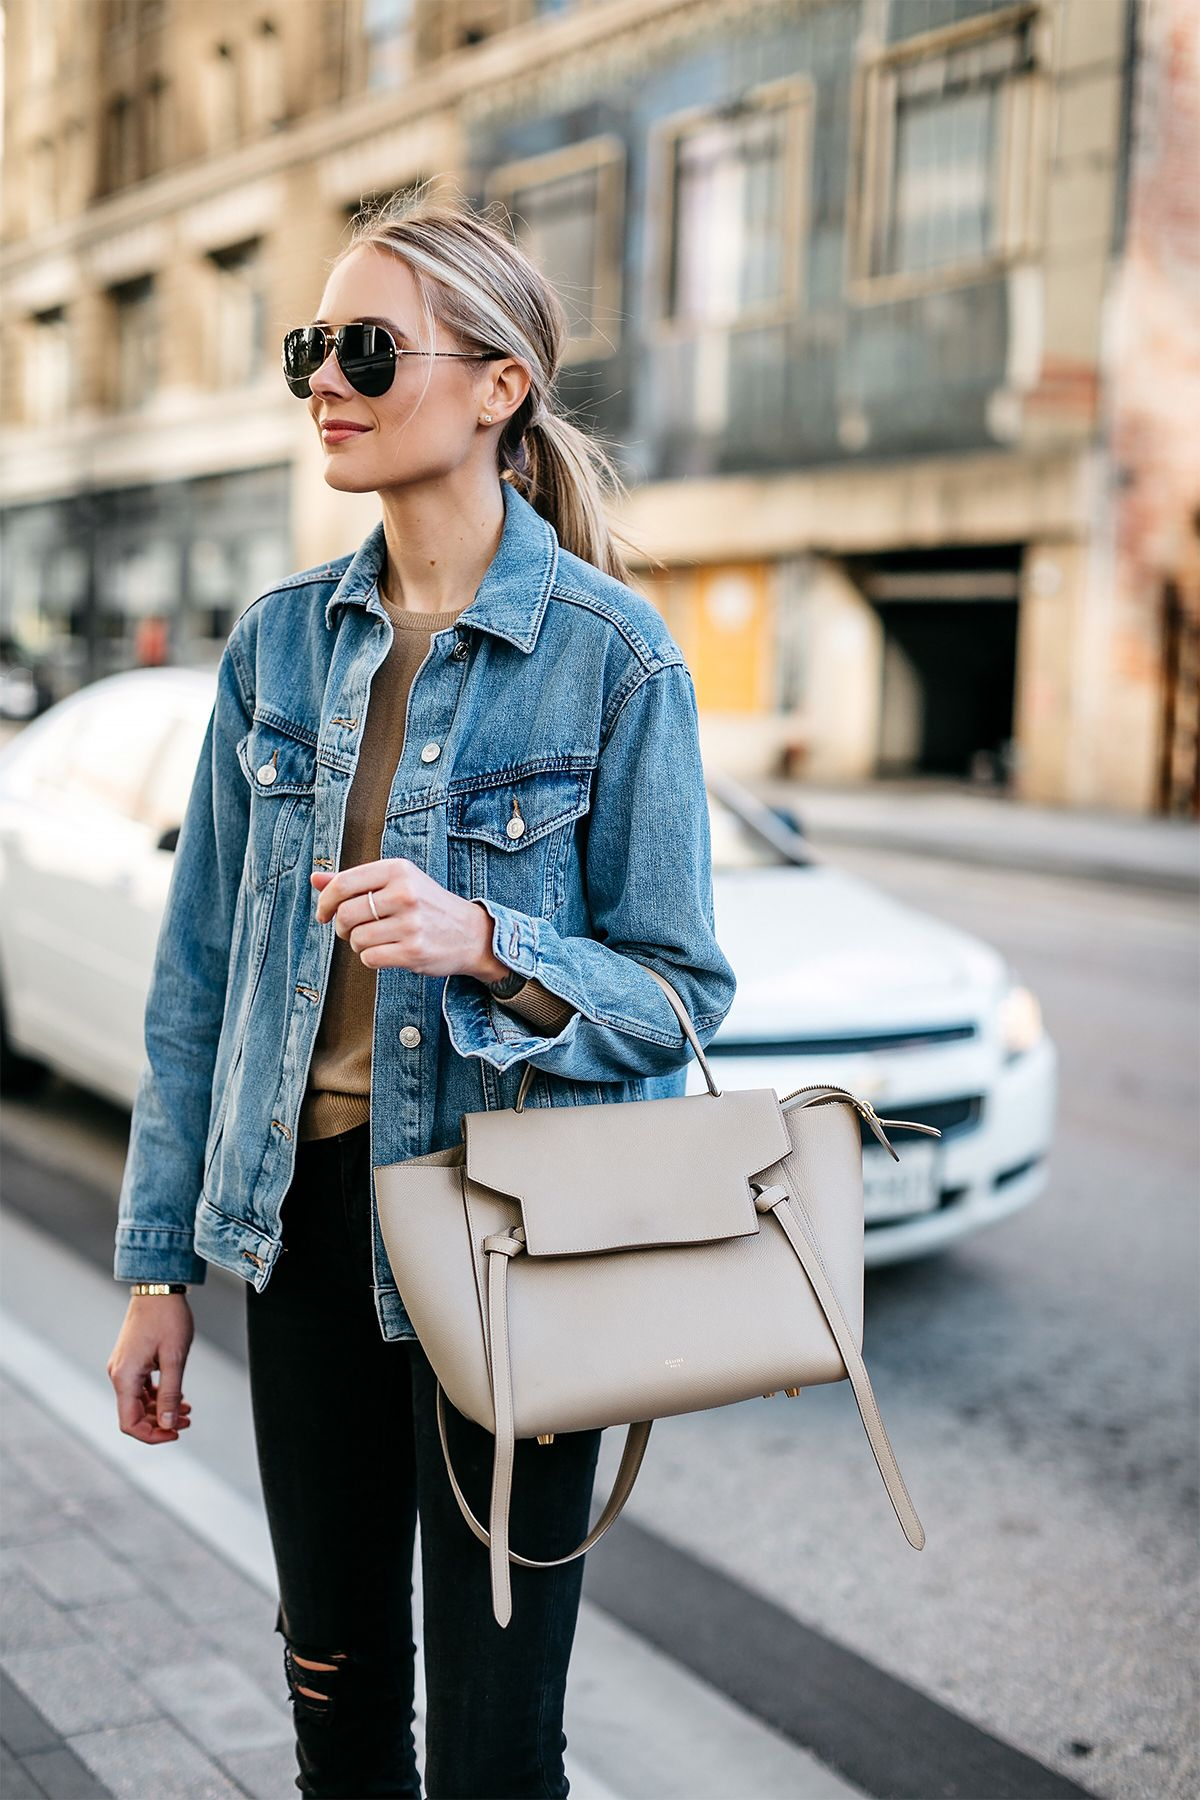 474fada368f46 Blonde Woman Wearing Topshop Oversized Denim Jacket Tan Sweater Black  Ripped Skinny Jeans Celine Mini Belt Bag Celine Aviator Sunglasses Fashion  Jackson ...